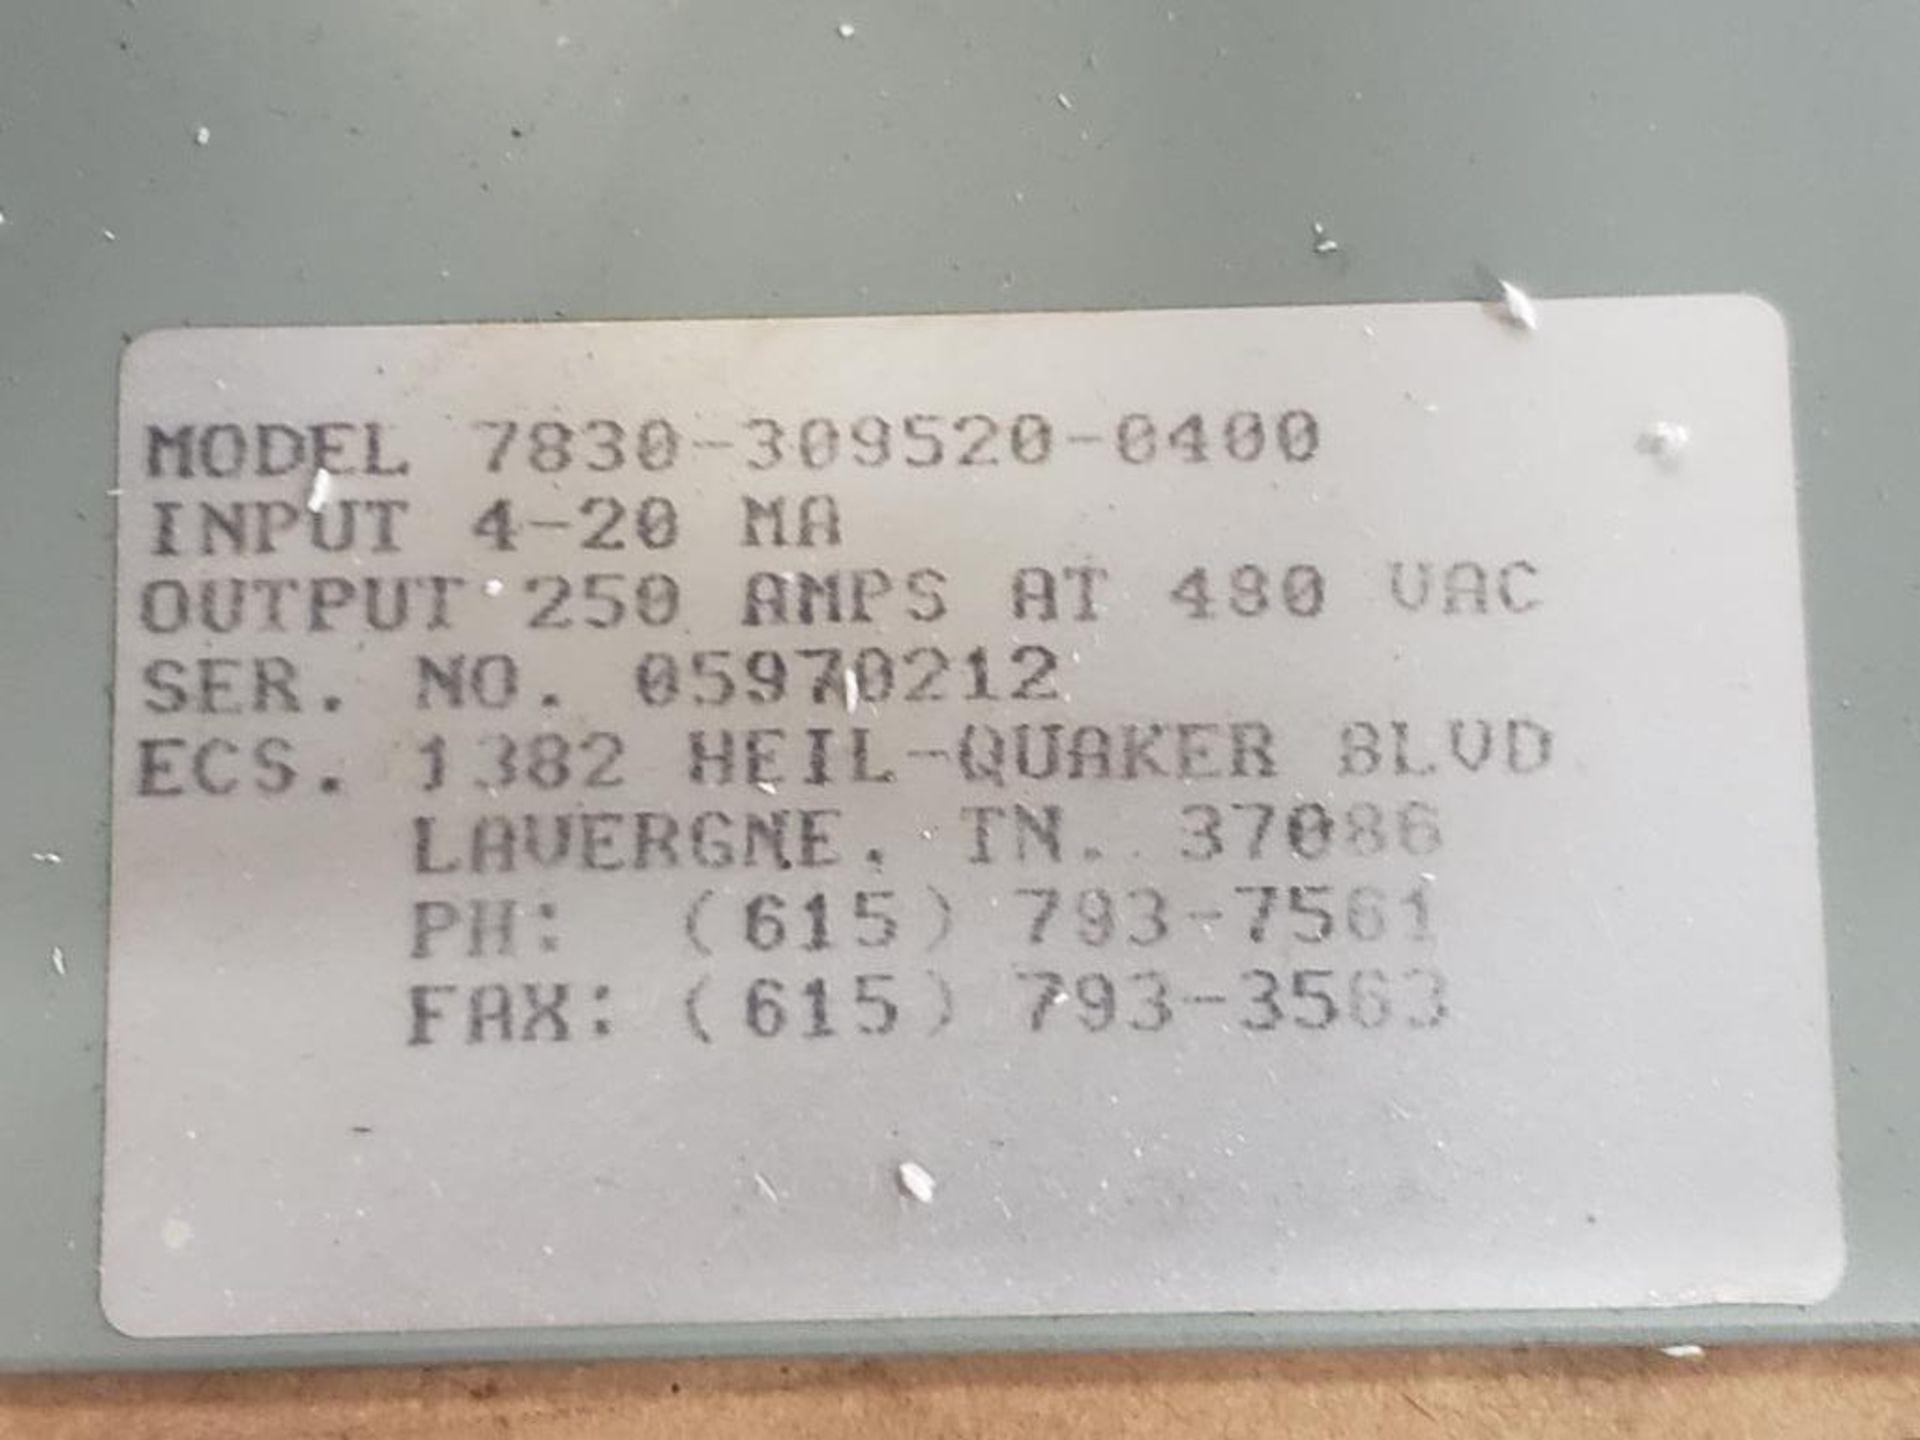 Chromalox 7830-309520-0400 power pak controller. - Image 2 of 10